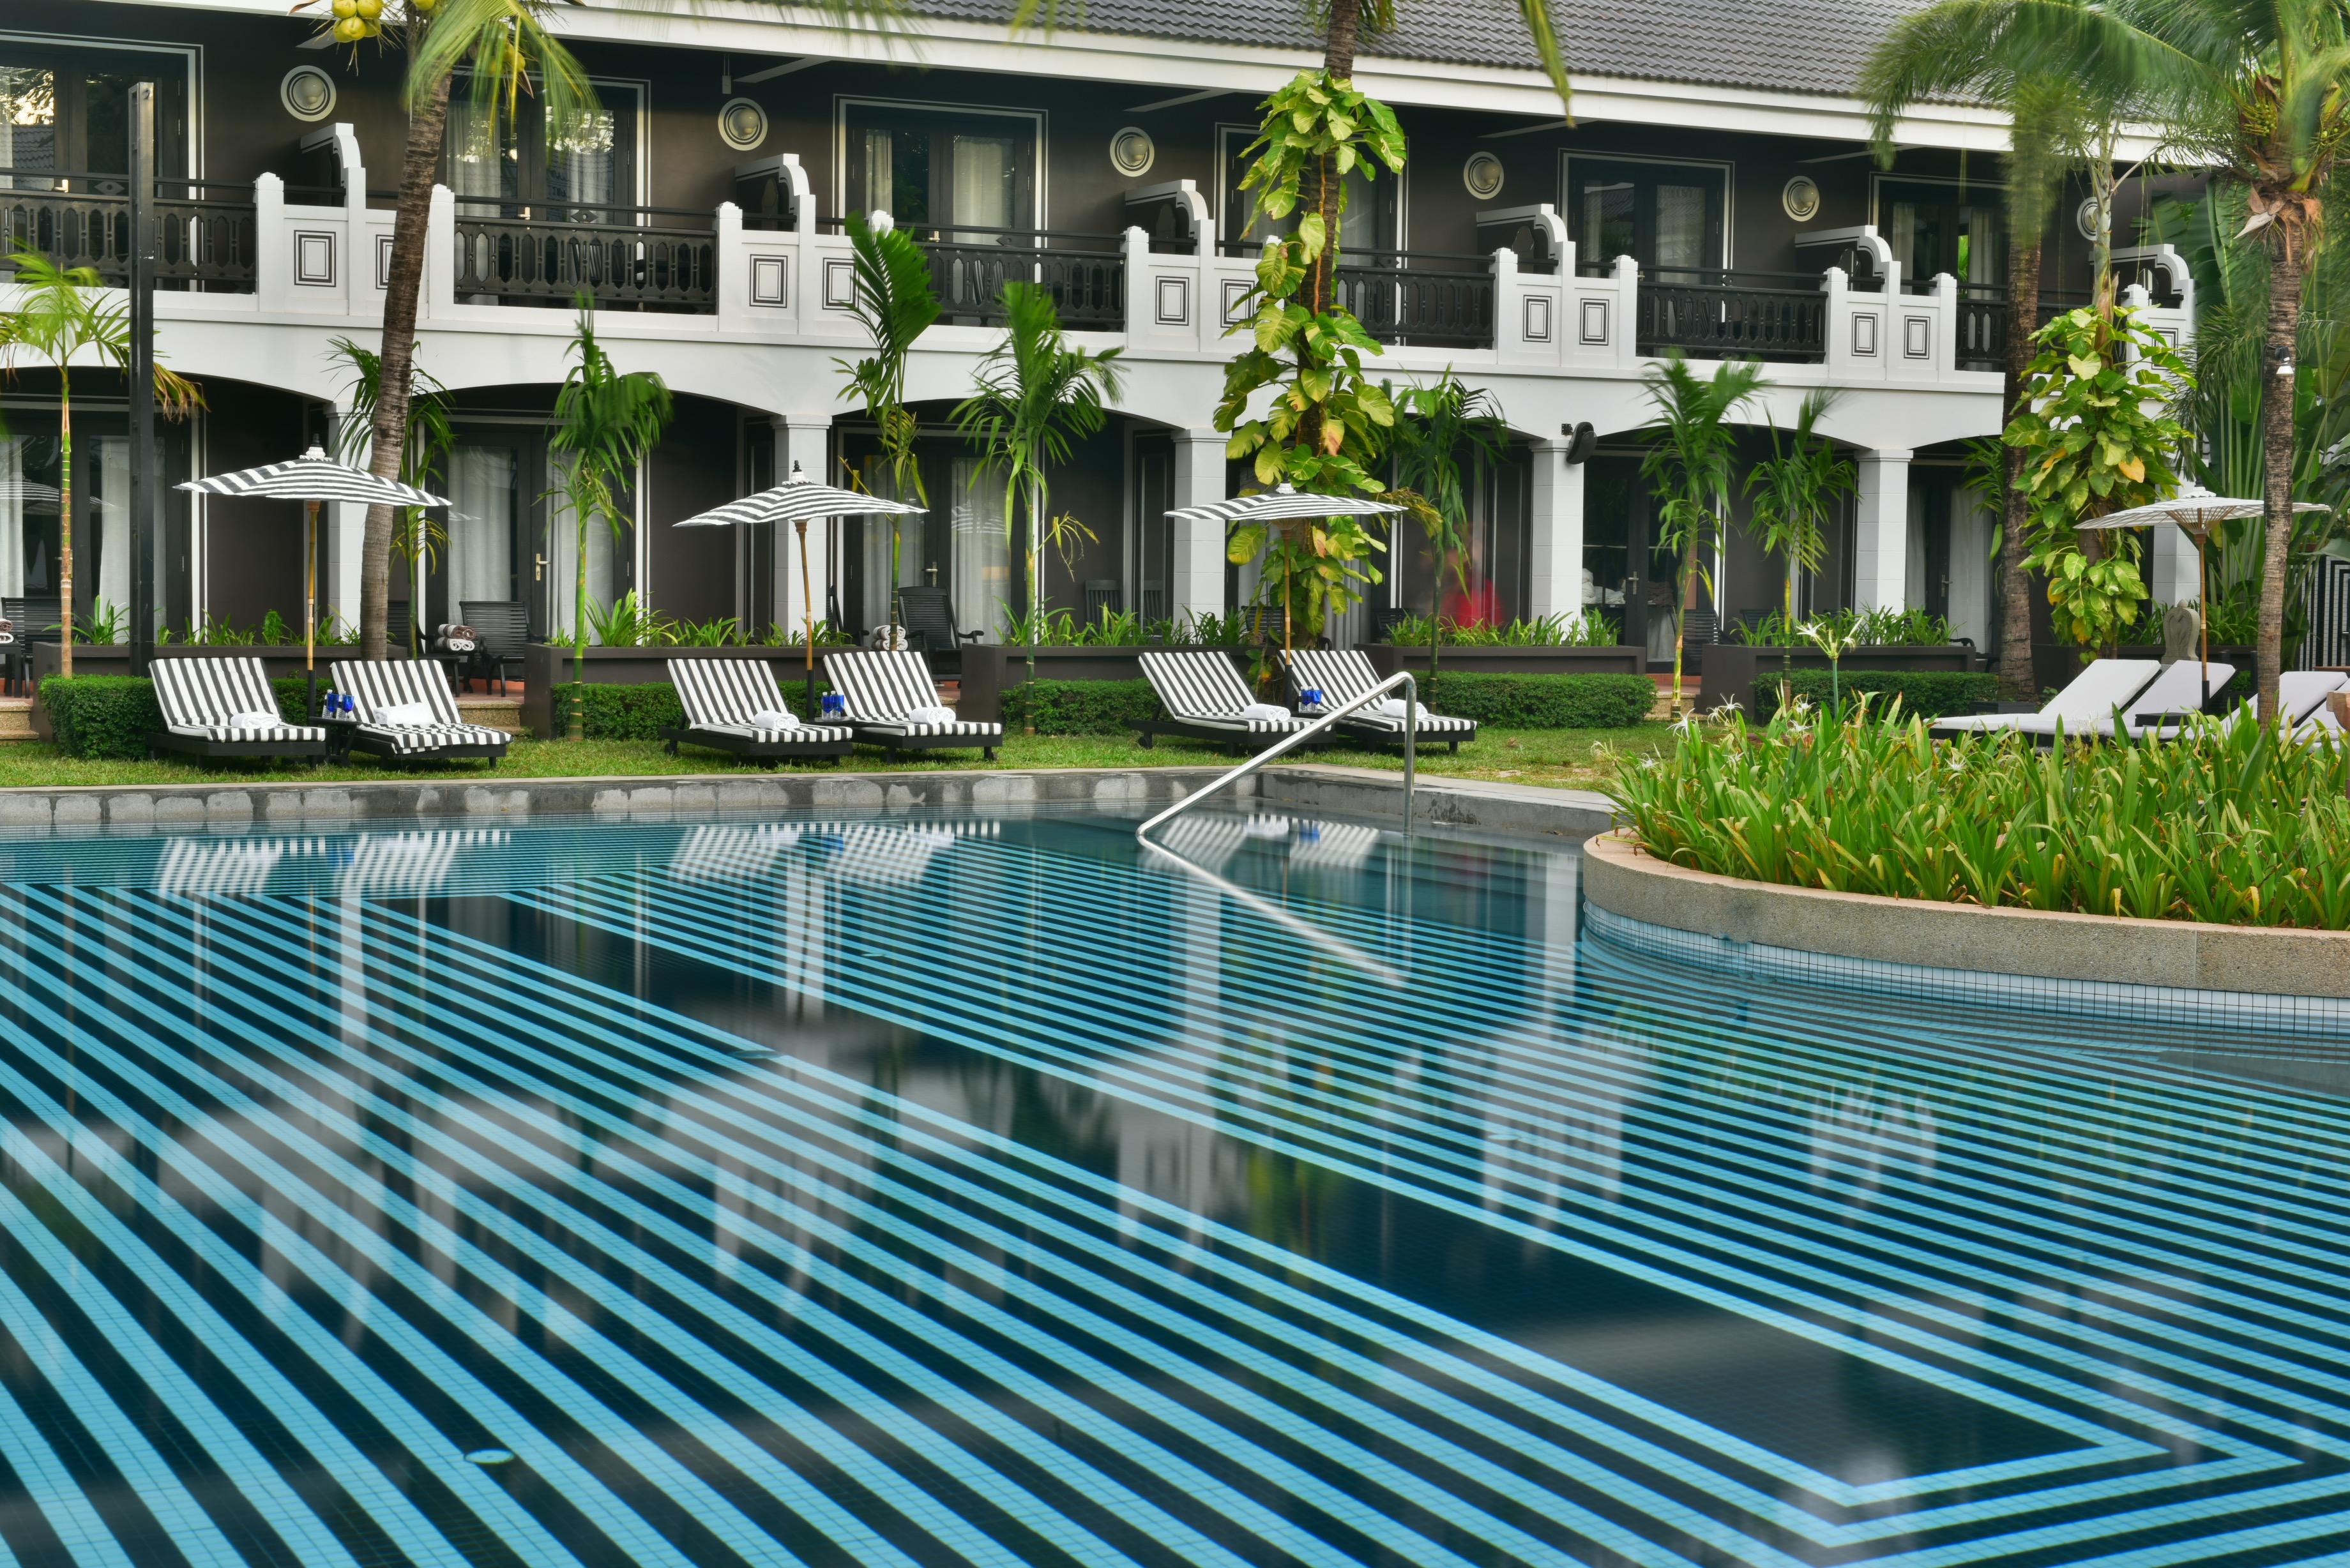 Cambodian Shinta Mani Hotels Announce Rebranding Of